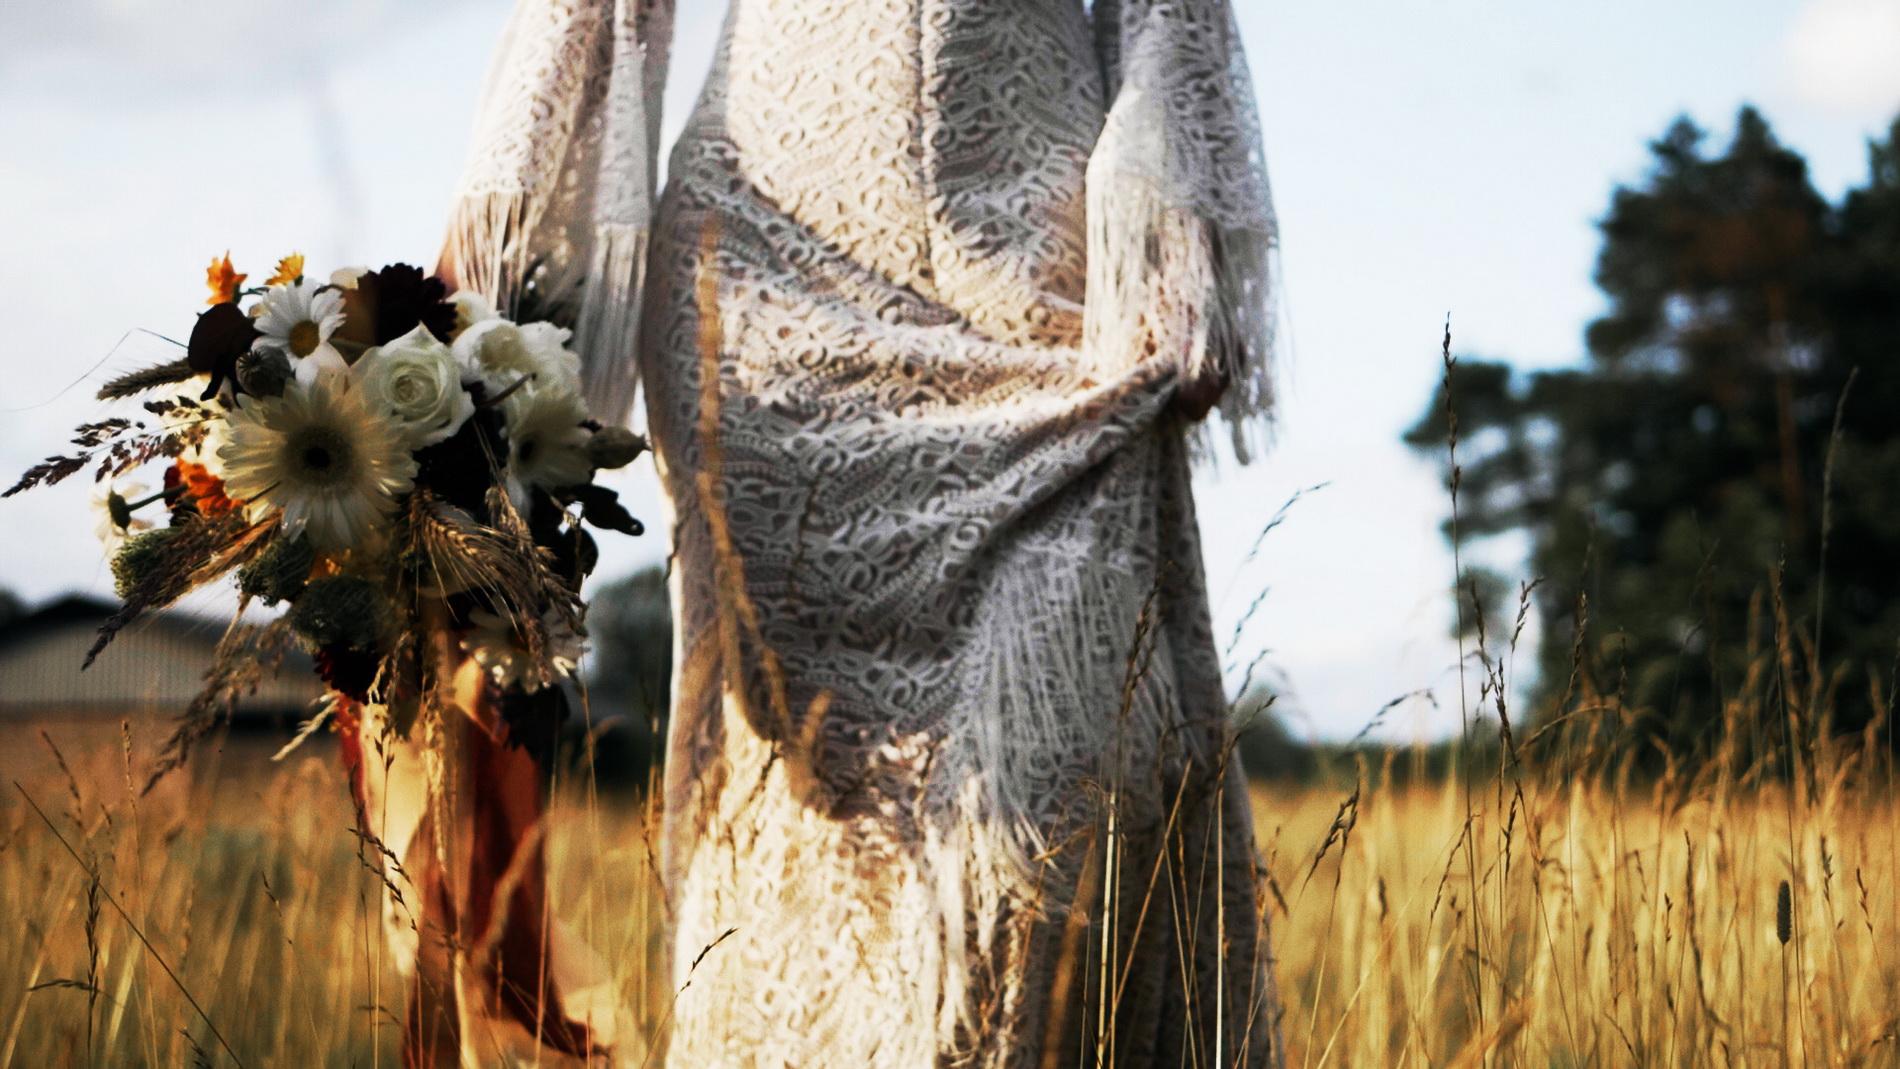 wedding_editorial_art_film_portrait_videographer_sesja_slubna_stylizowana_boho_filmowca_teledysk_slubny 02 (8).jpg